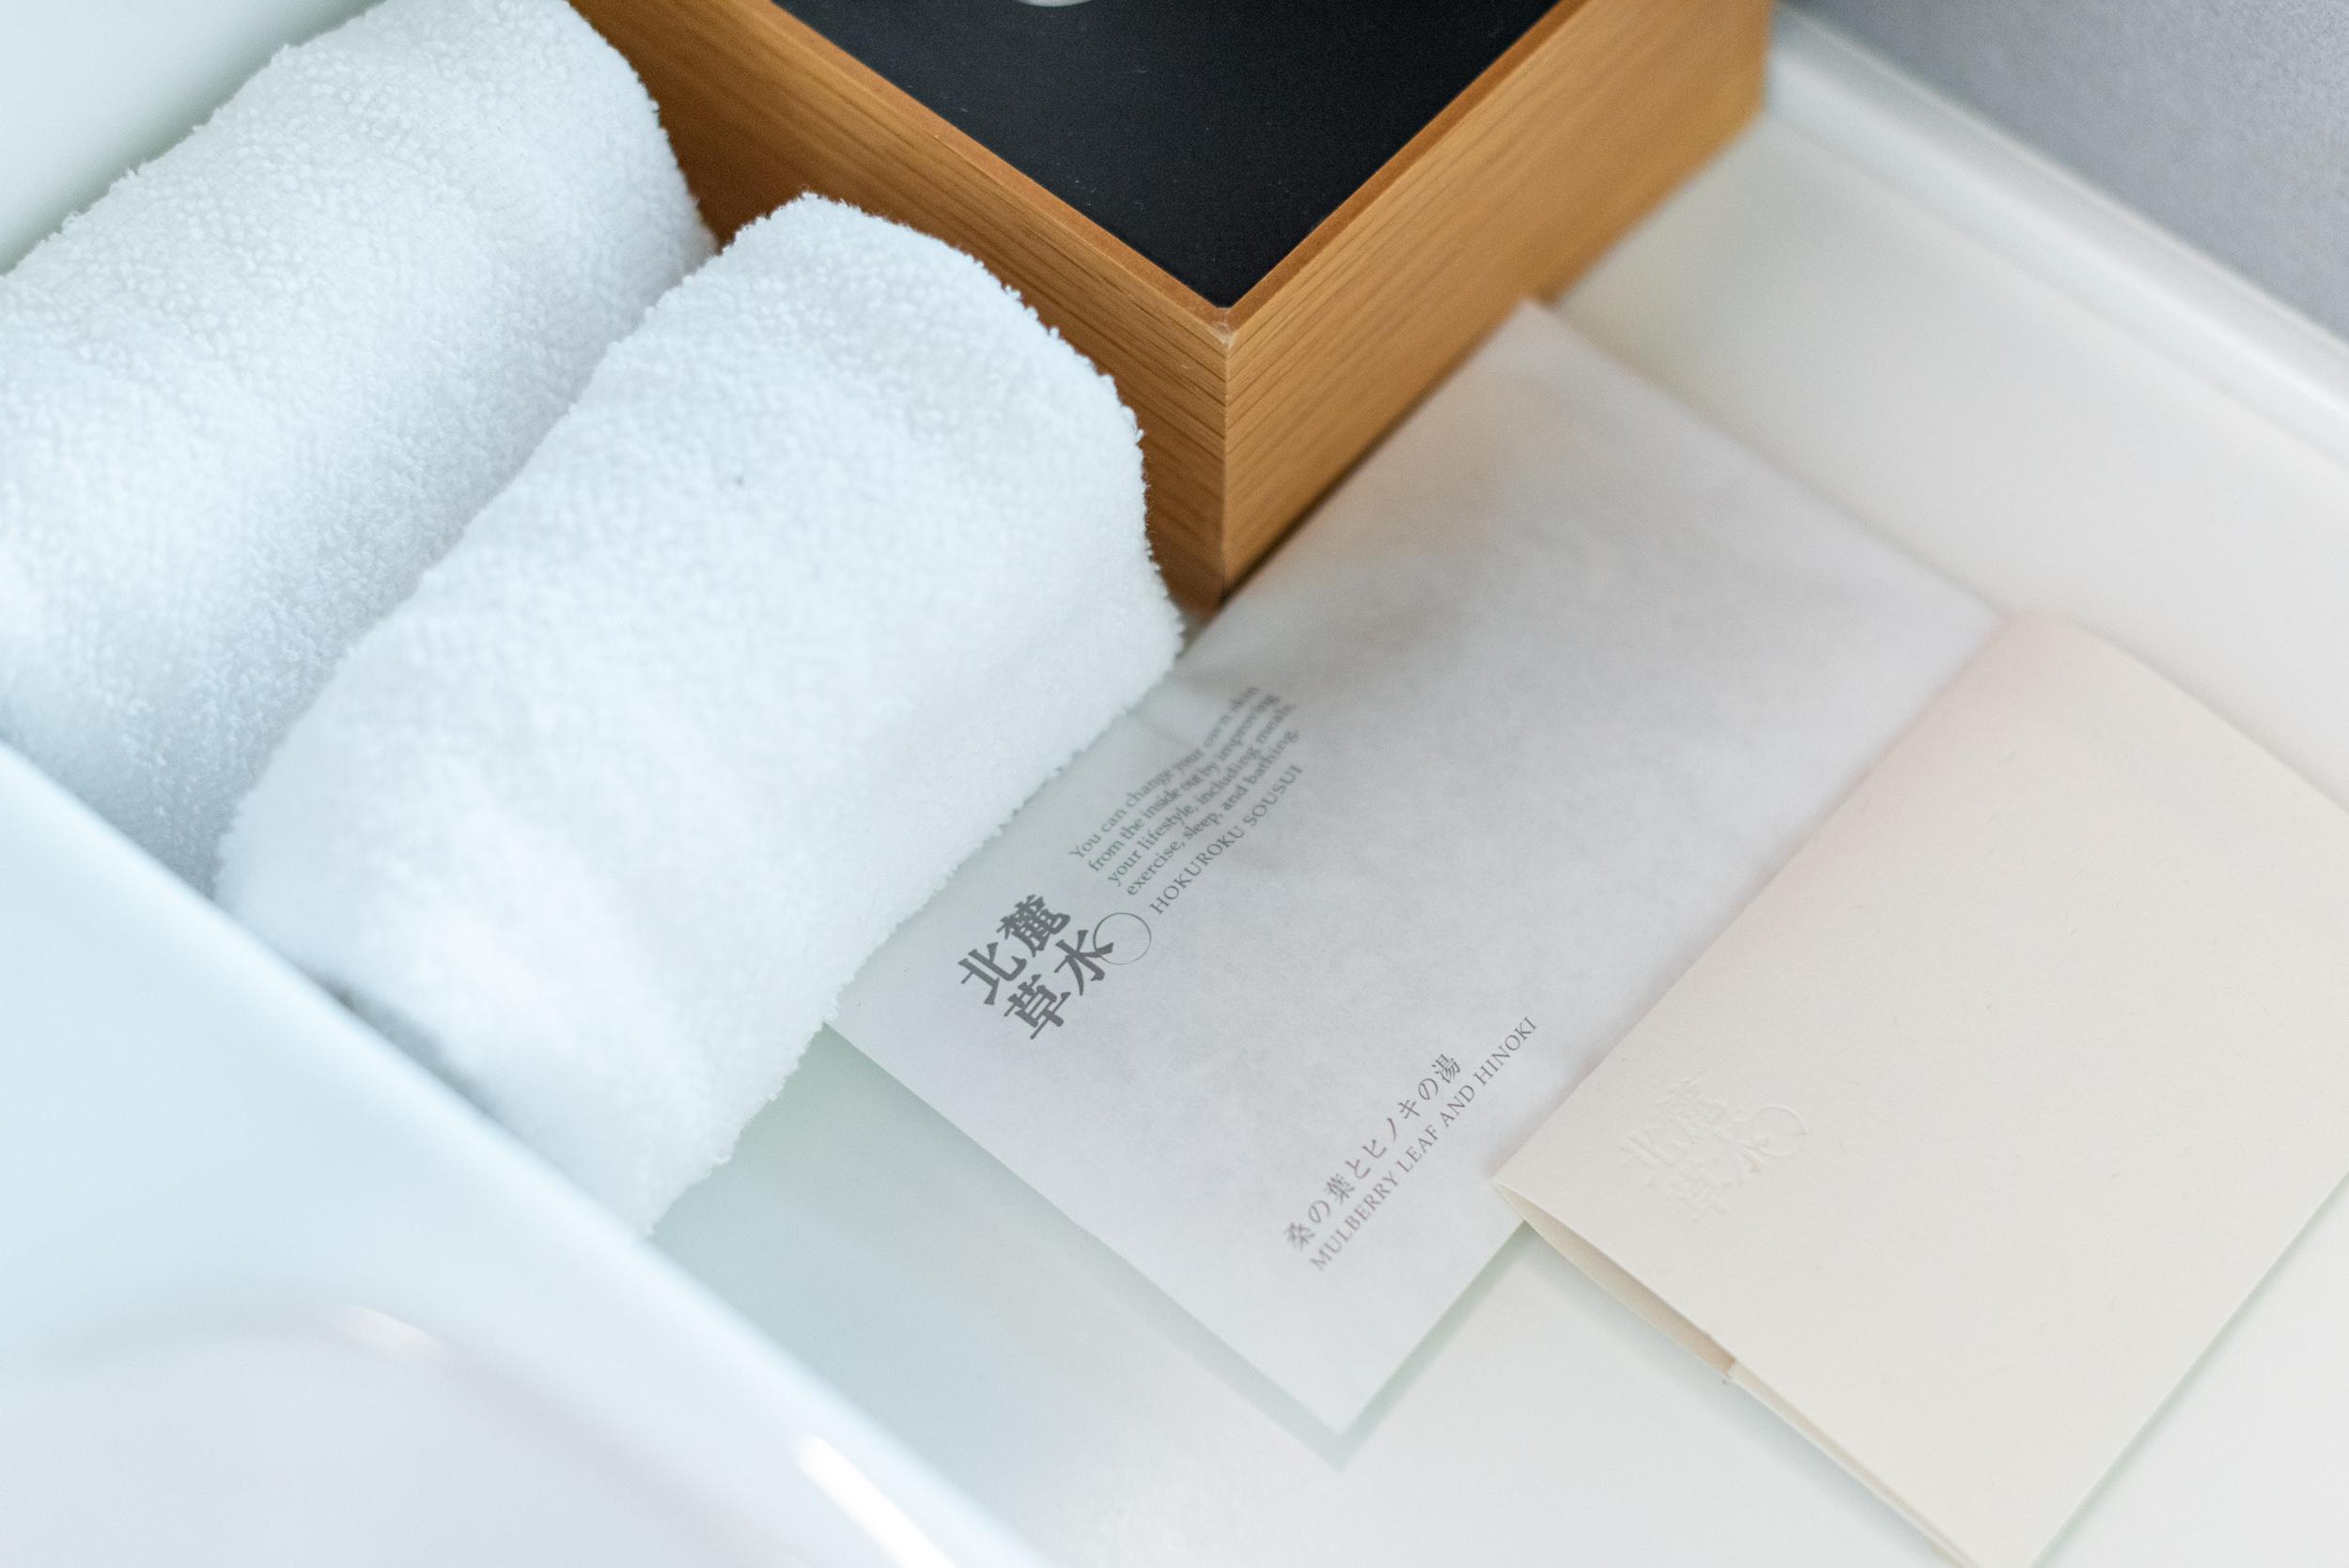 HOSHINOYA Fuji Review-5341.jpg